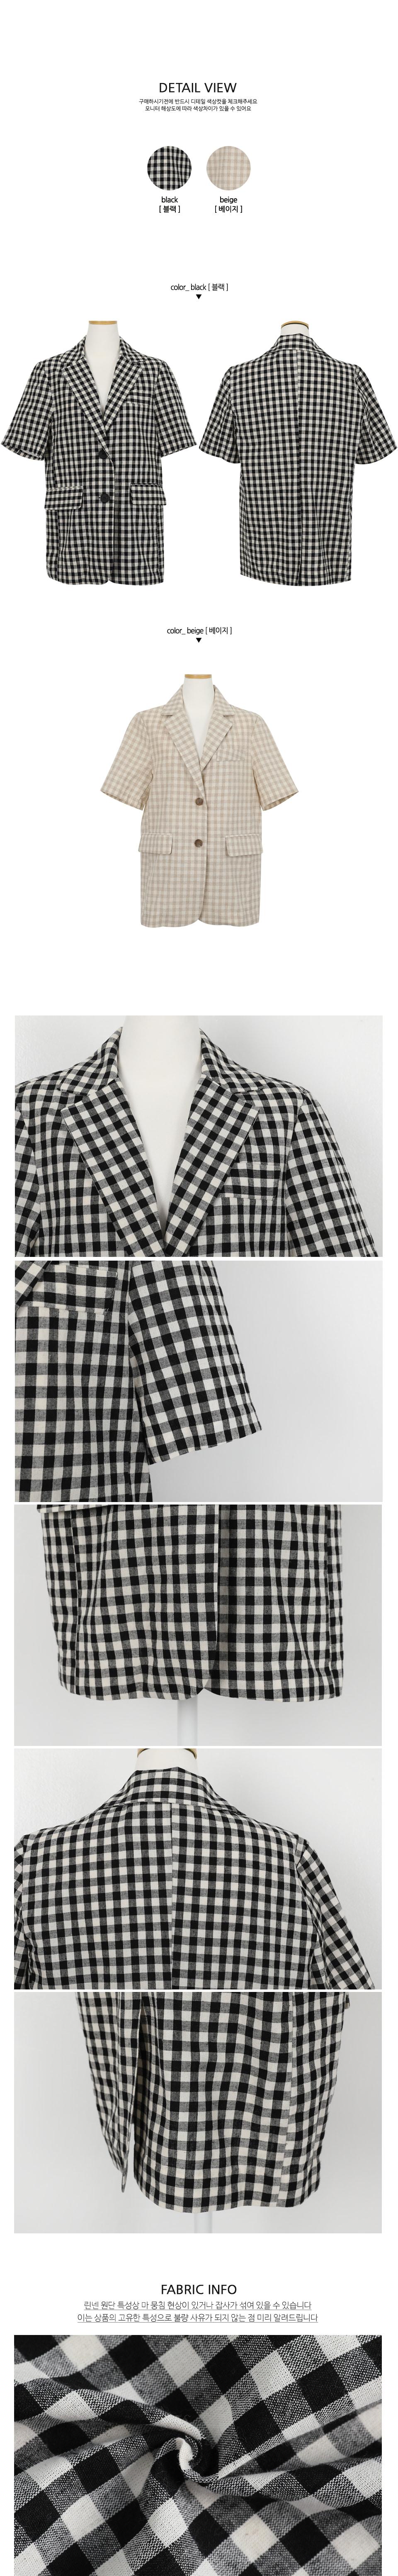 Roman linen check jacket